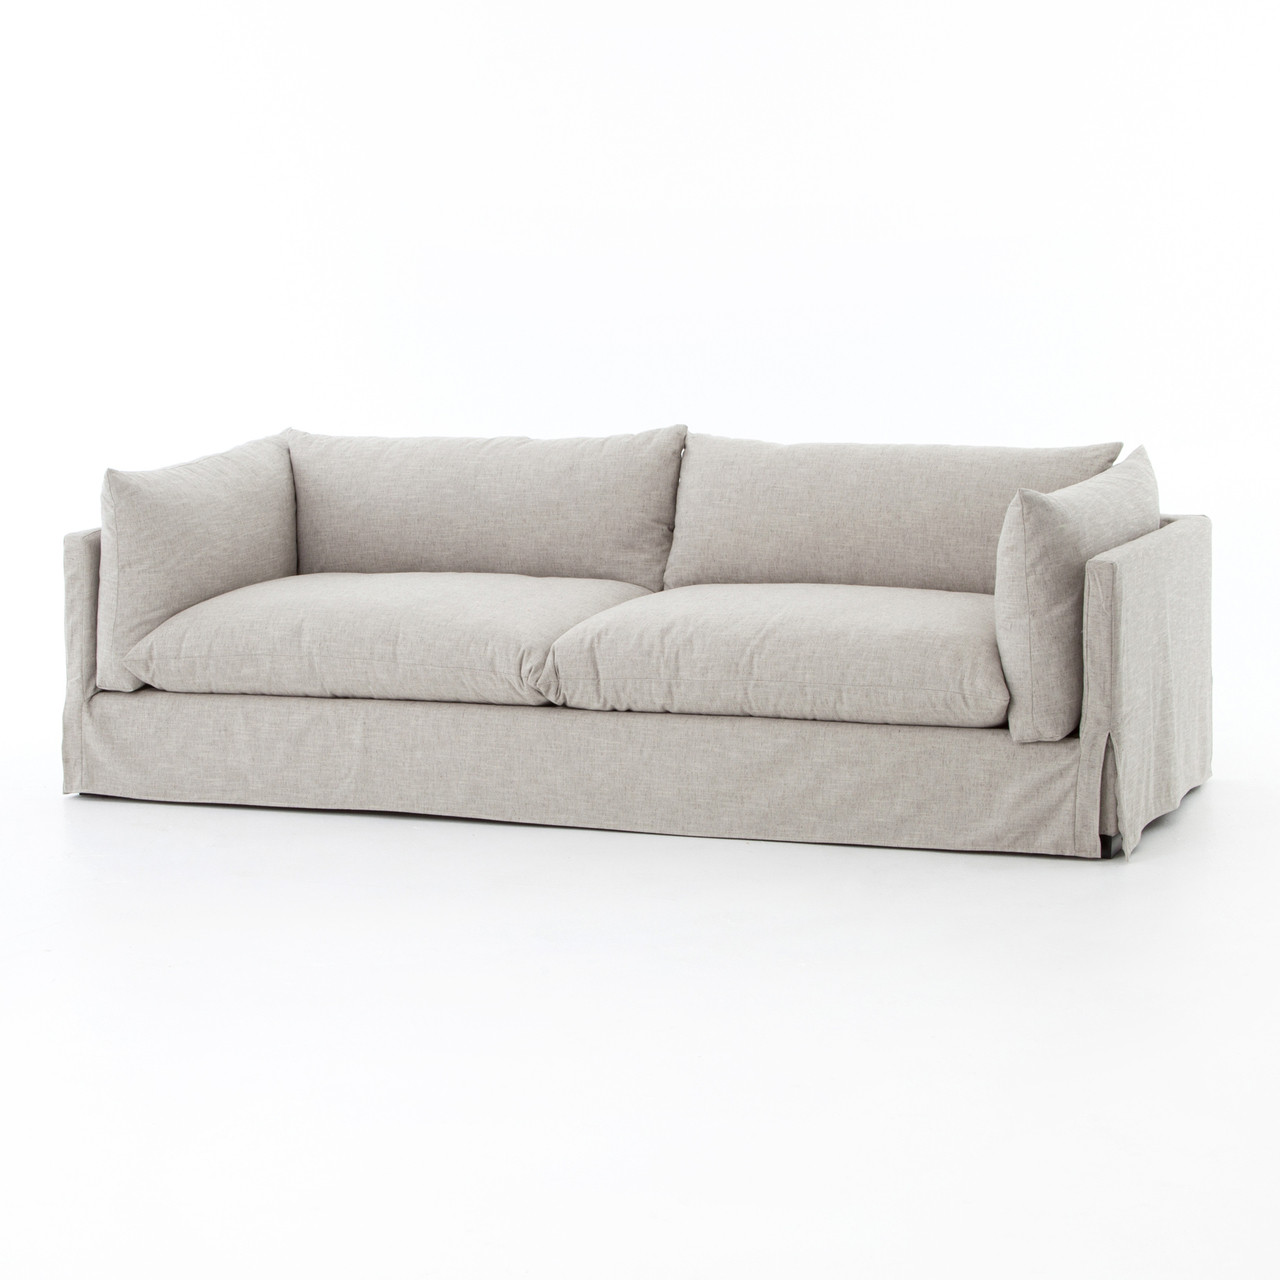 Loft Modern Beige Slipcovered Lounge Sofa 96\